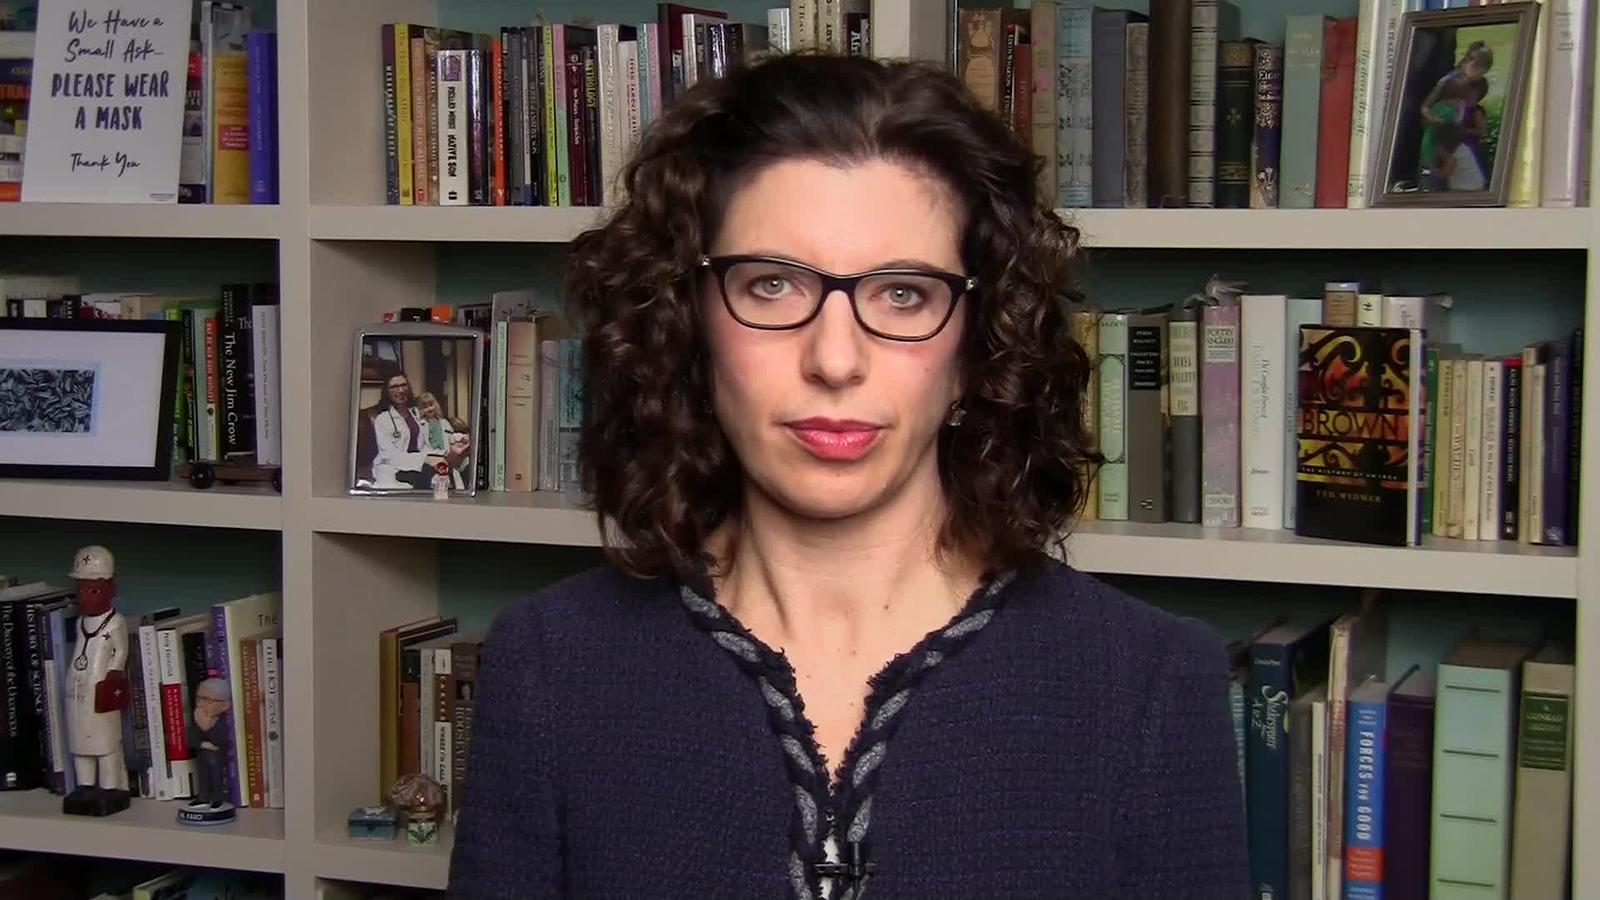 Dr. Megan Ranney